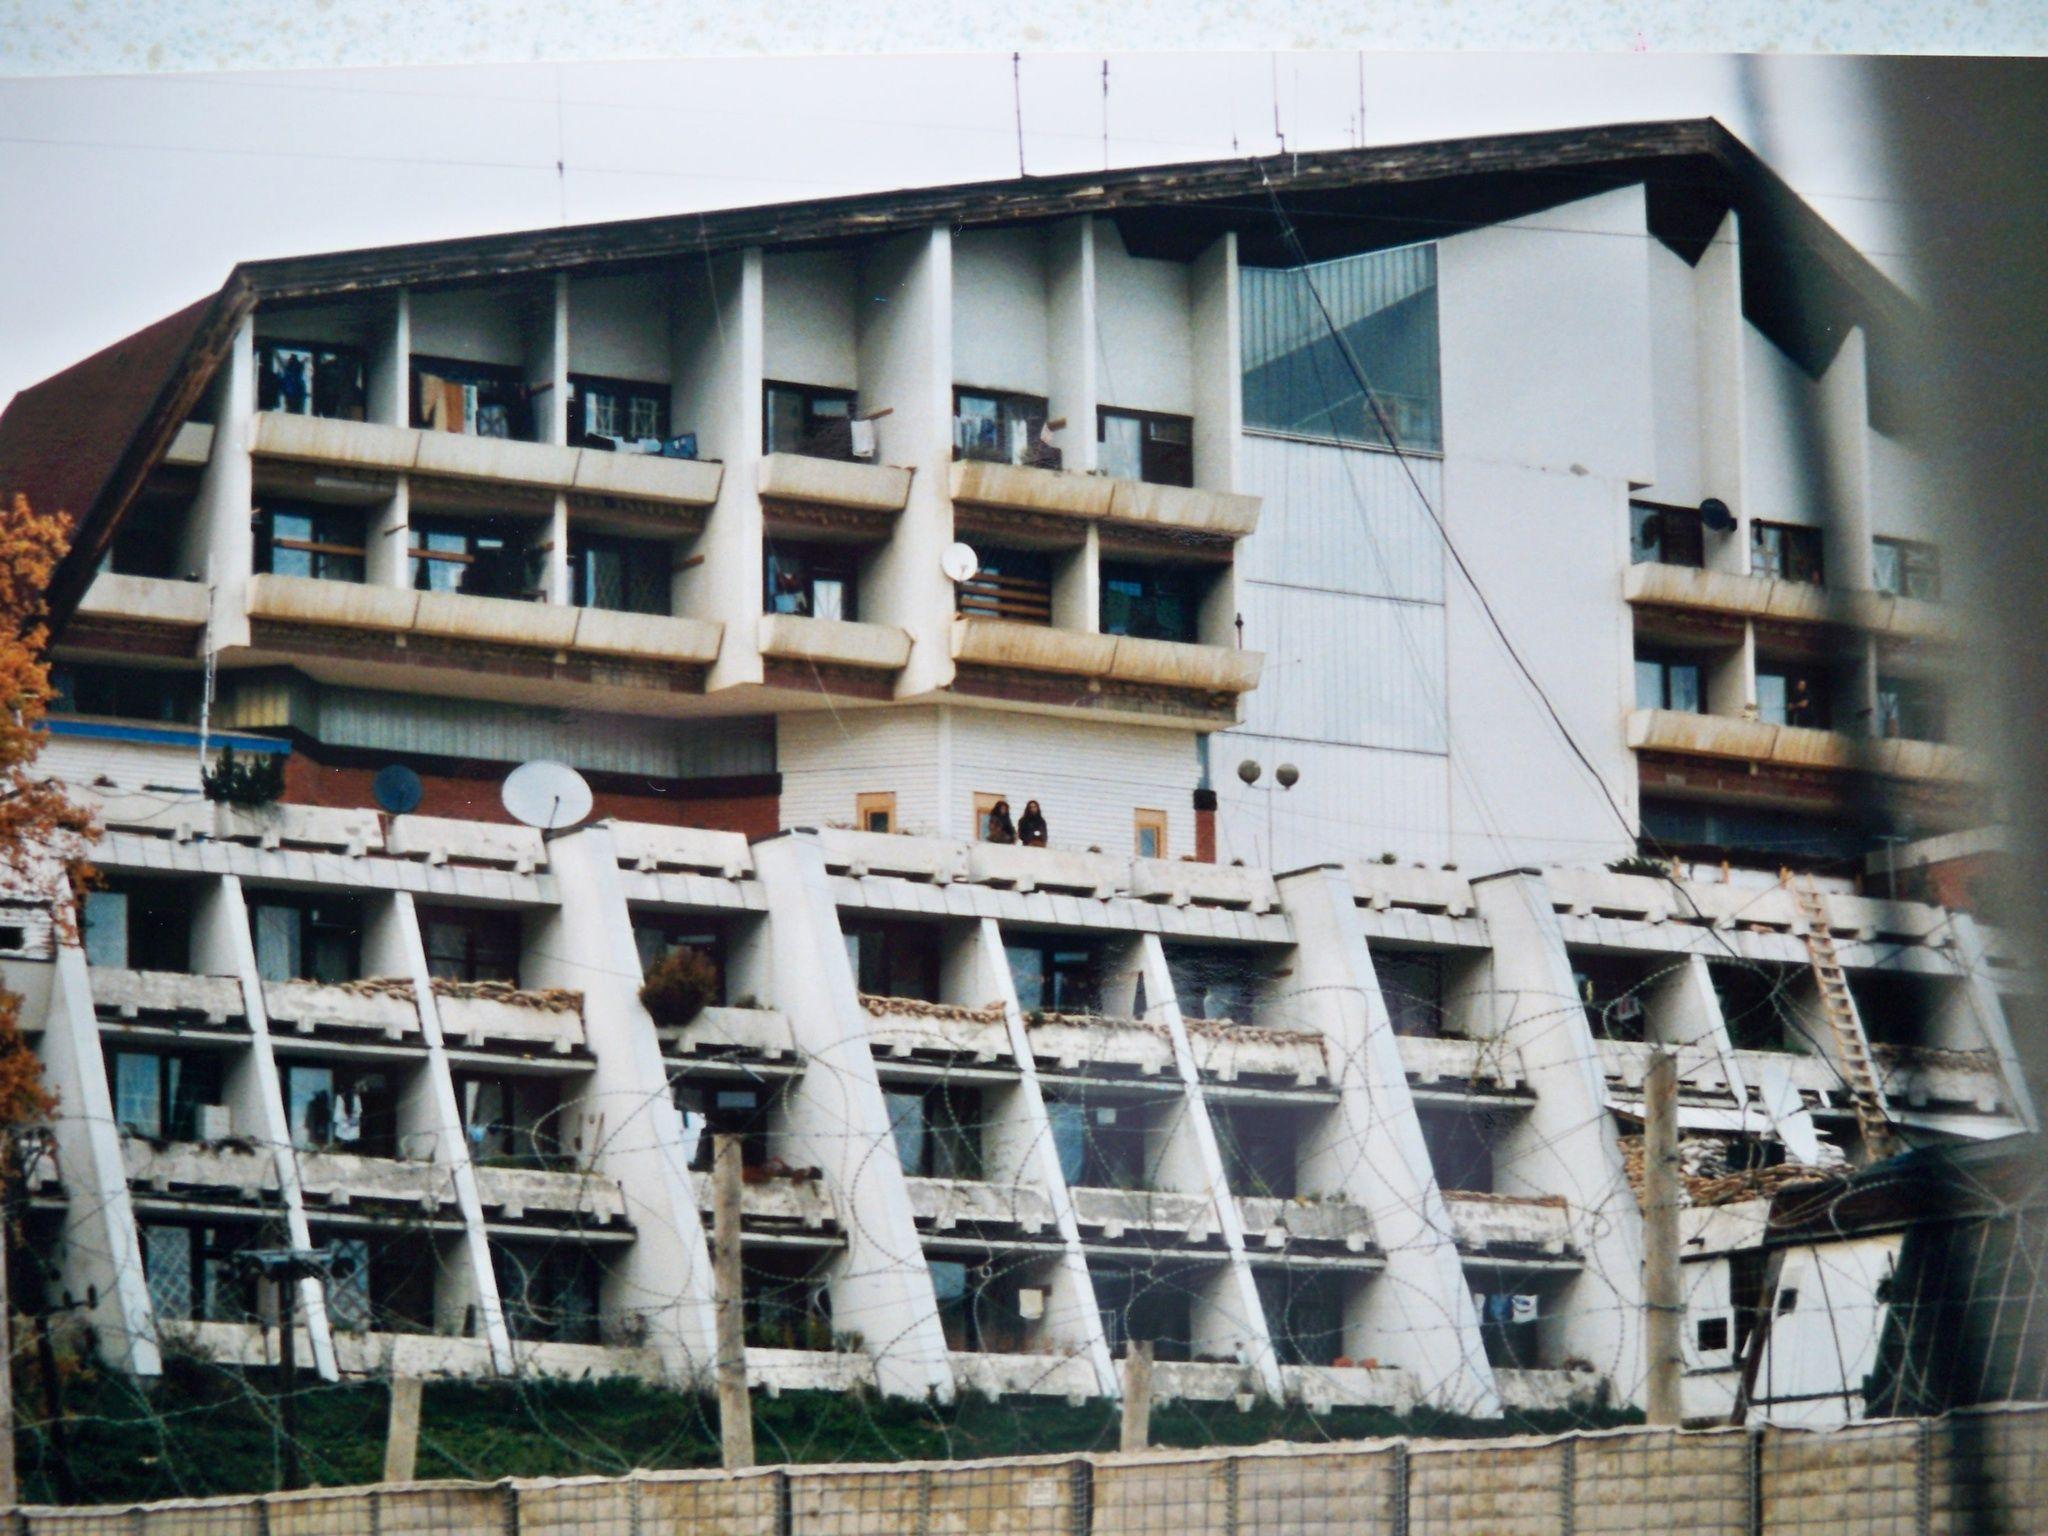 UN headquarter Kiseljak 1993 during that terrible war